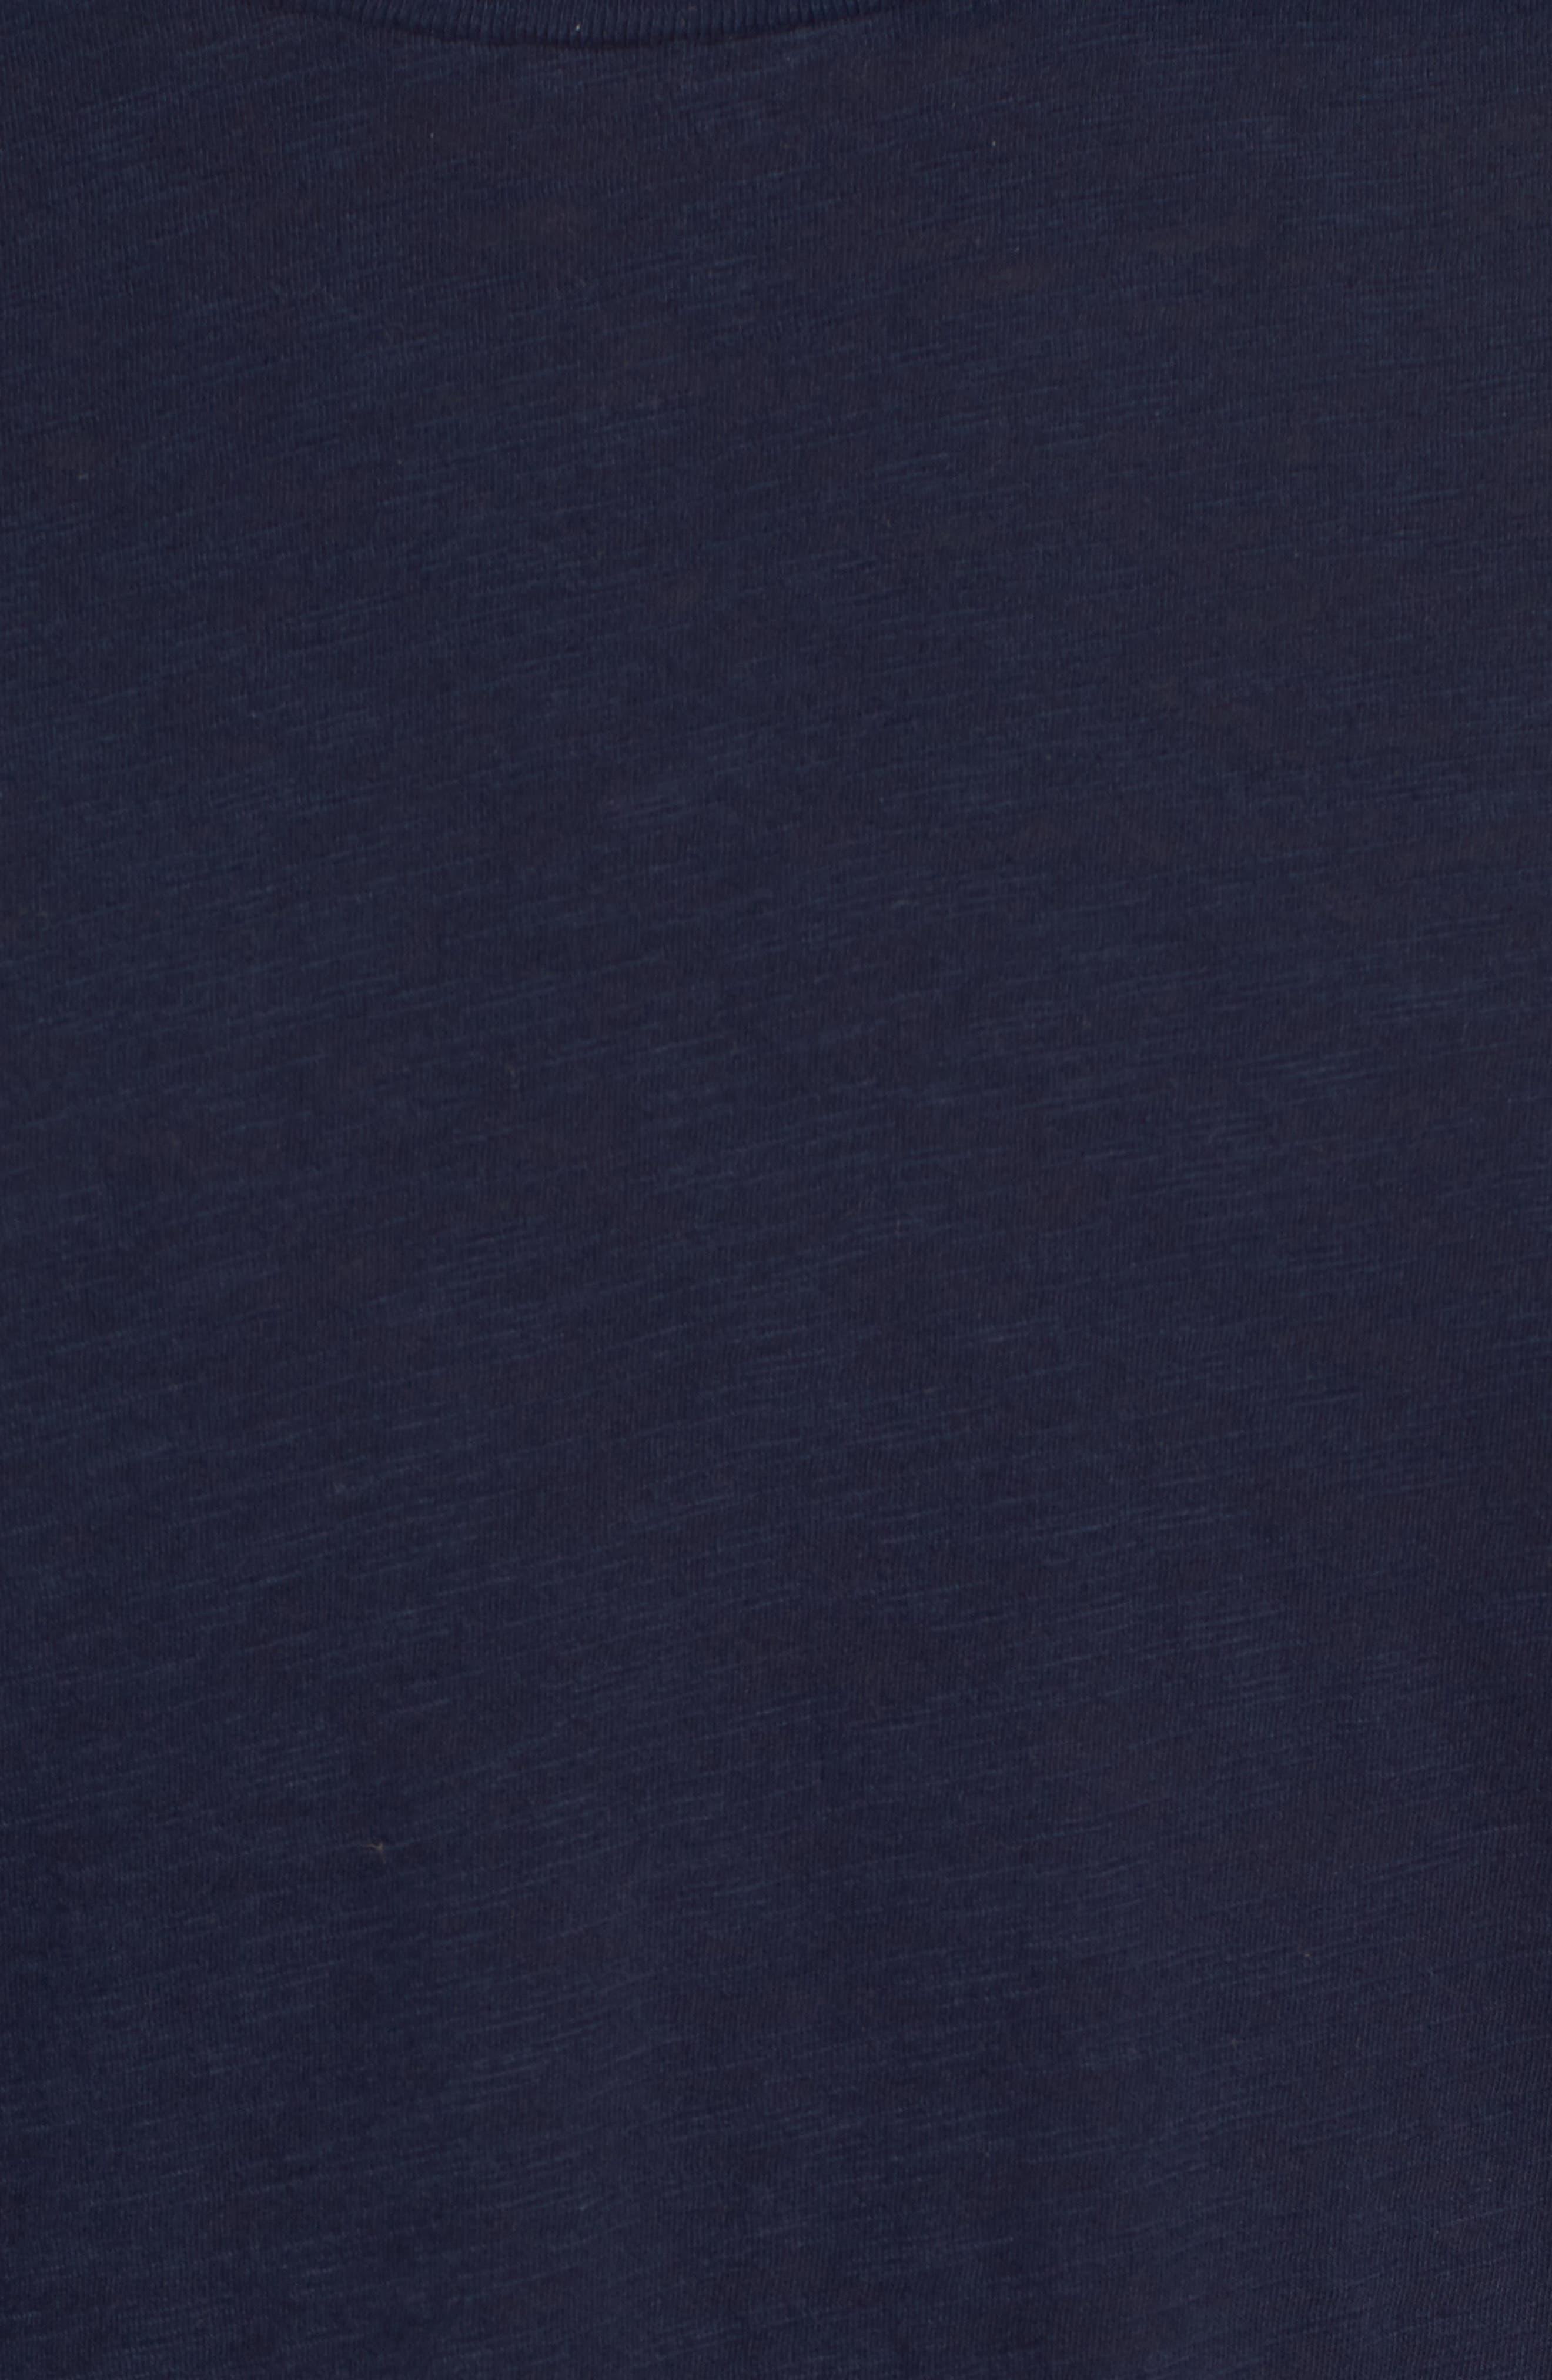 Raglan T-Shirt,                             Alternate thumbnail 5, color,                             Indigo Stripe Shibori Indigo